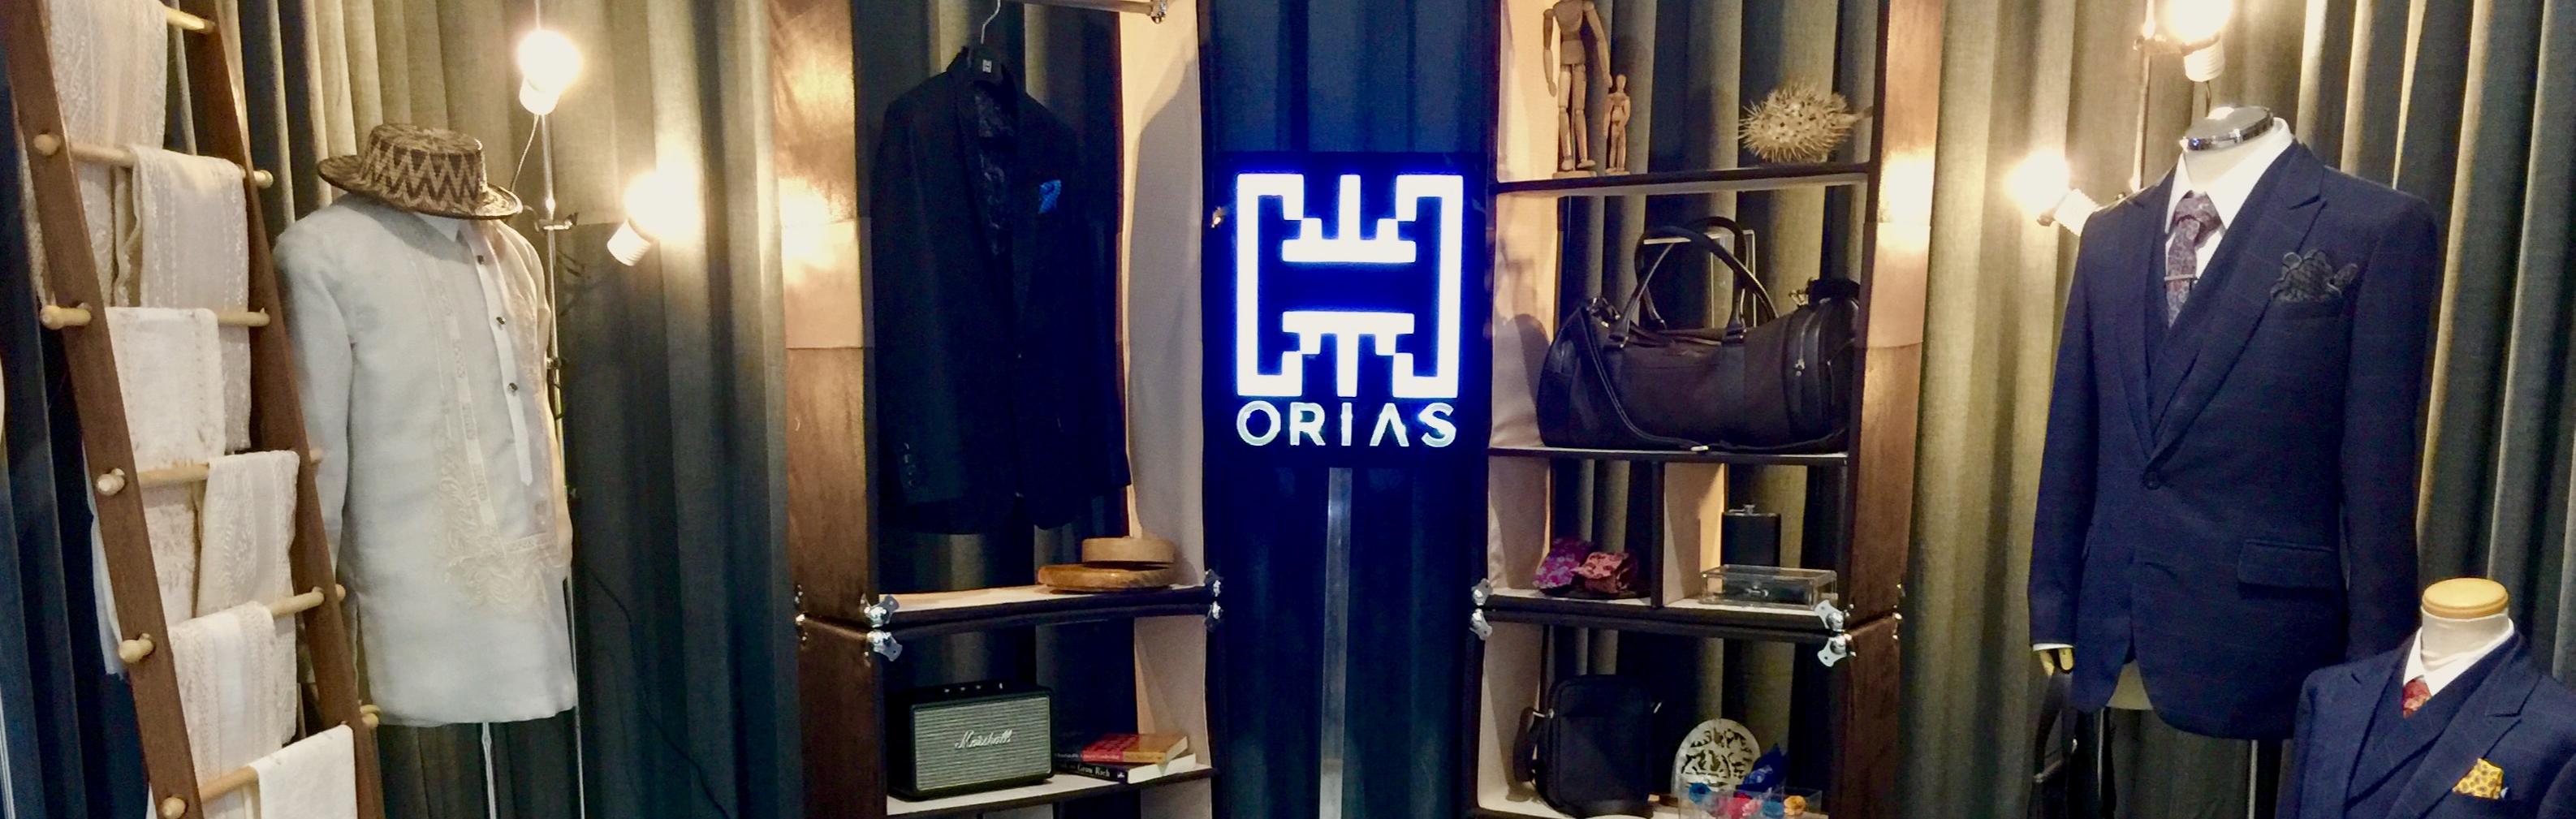 Orias Studios